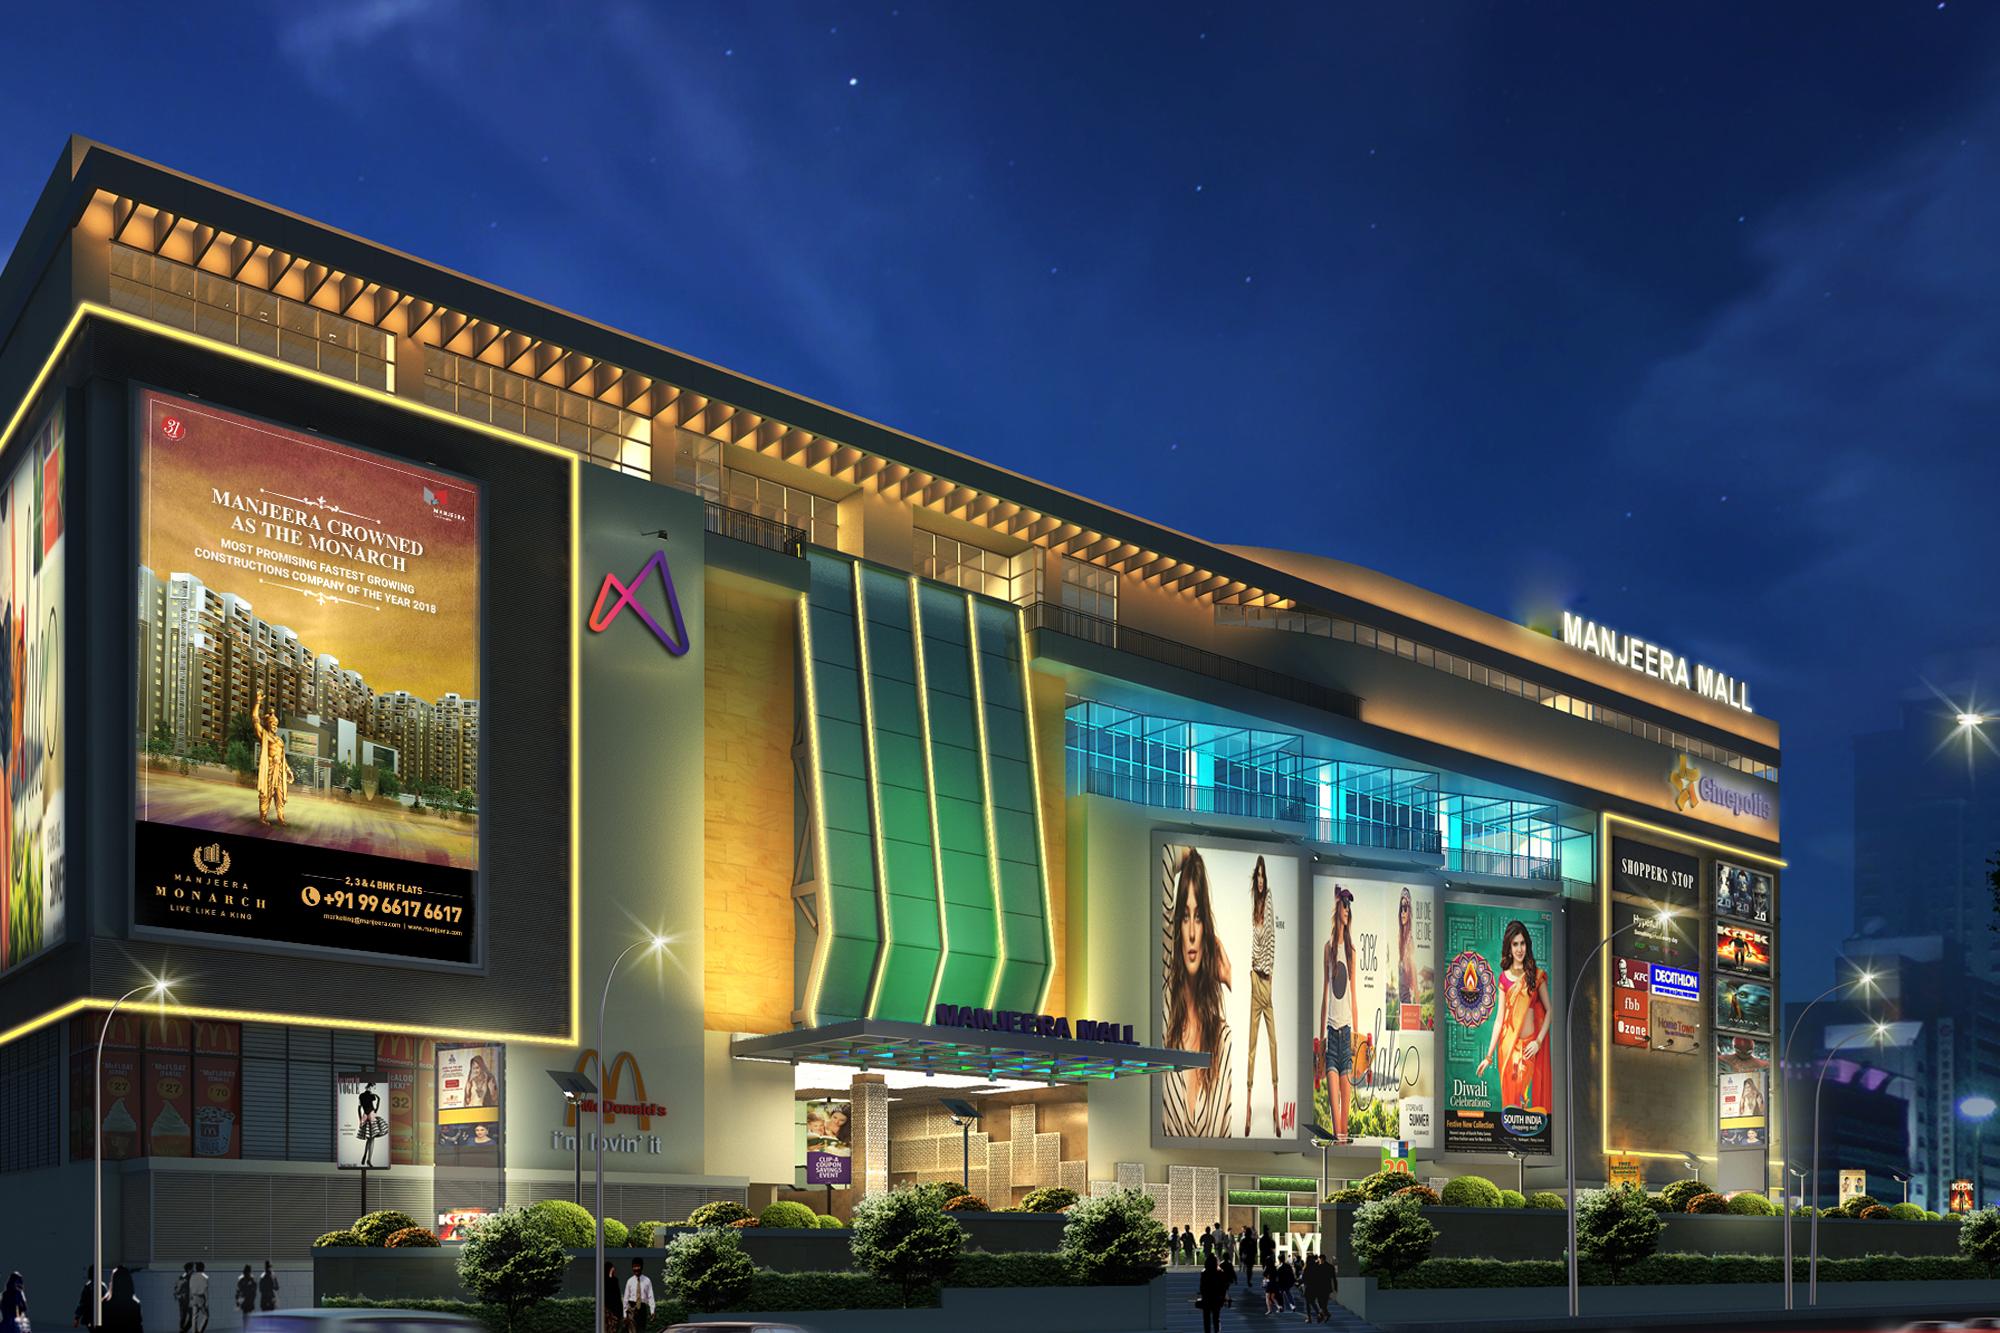 Manjeera Mall Hyderabad